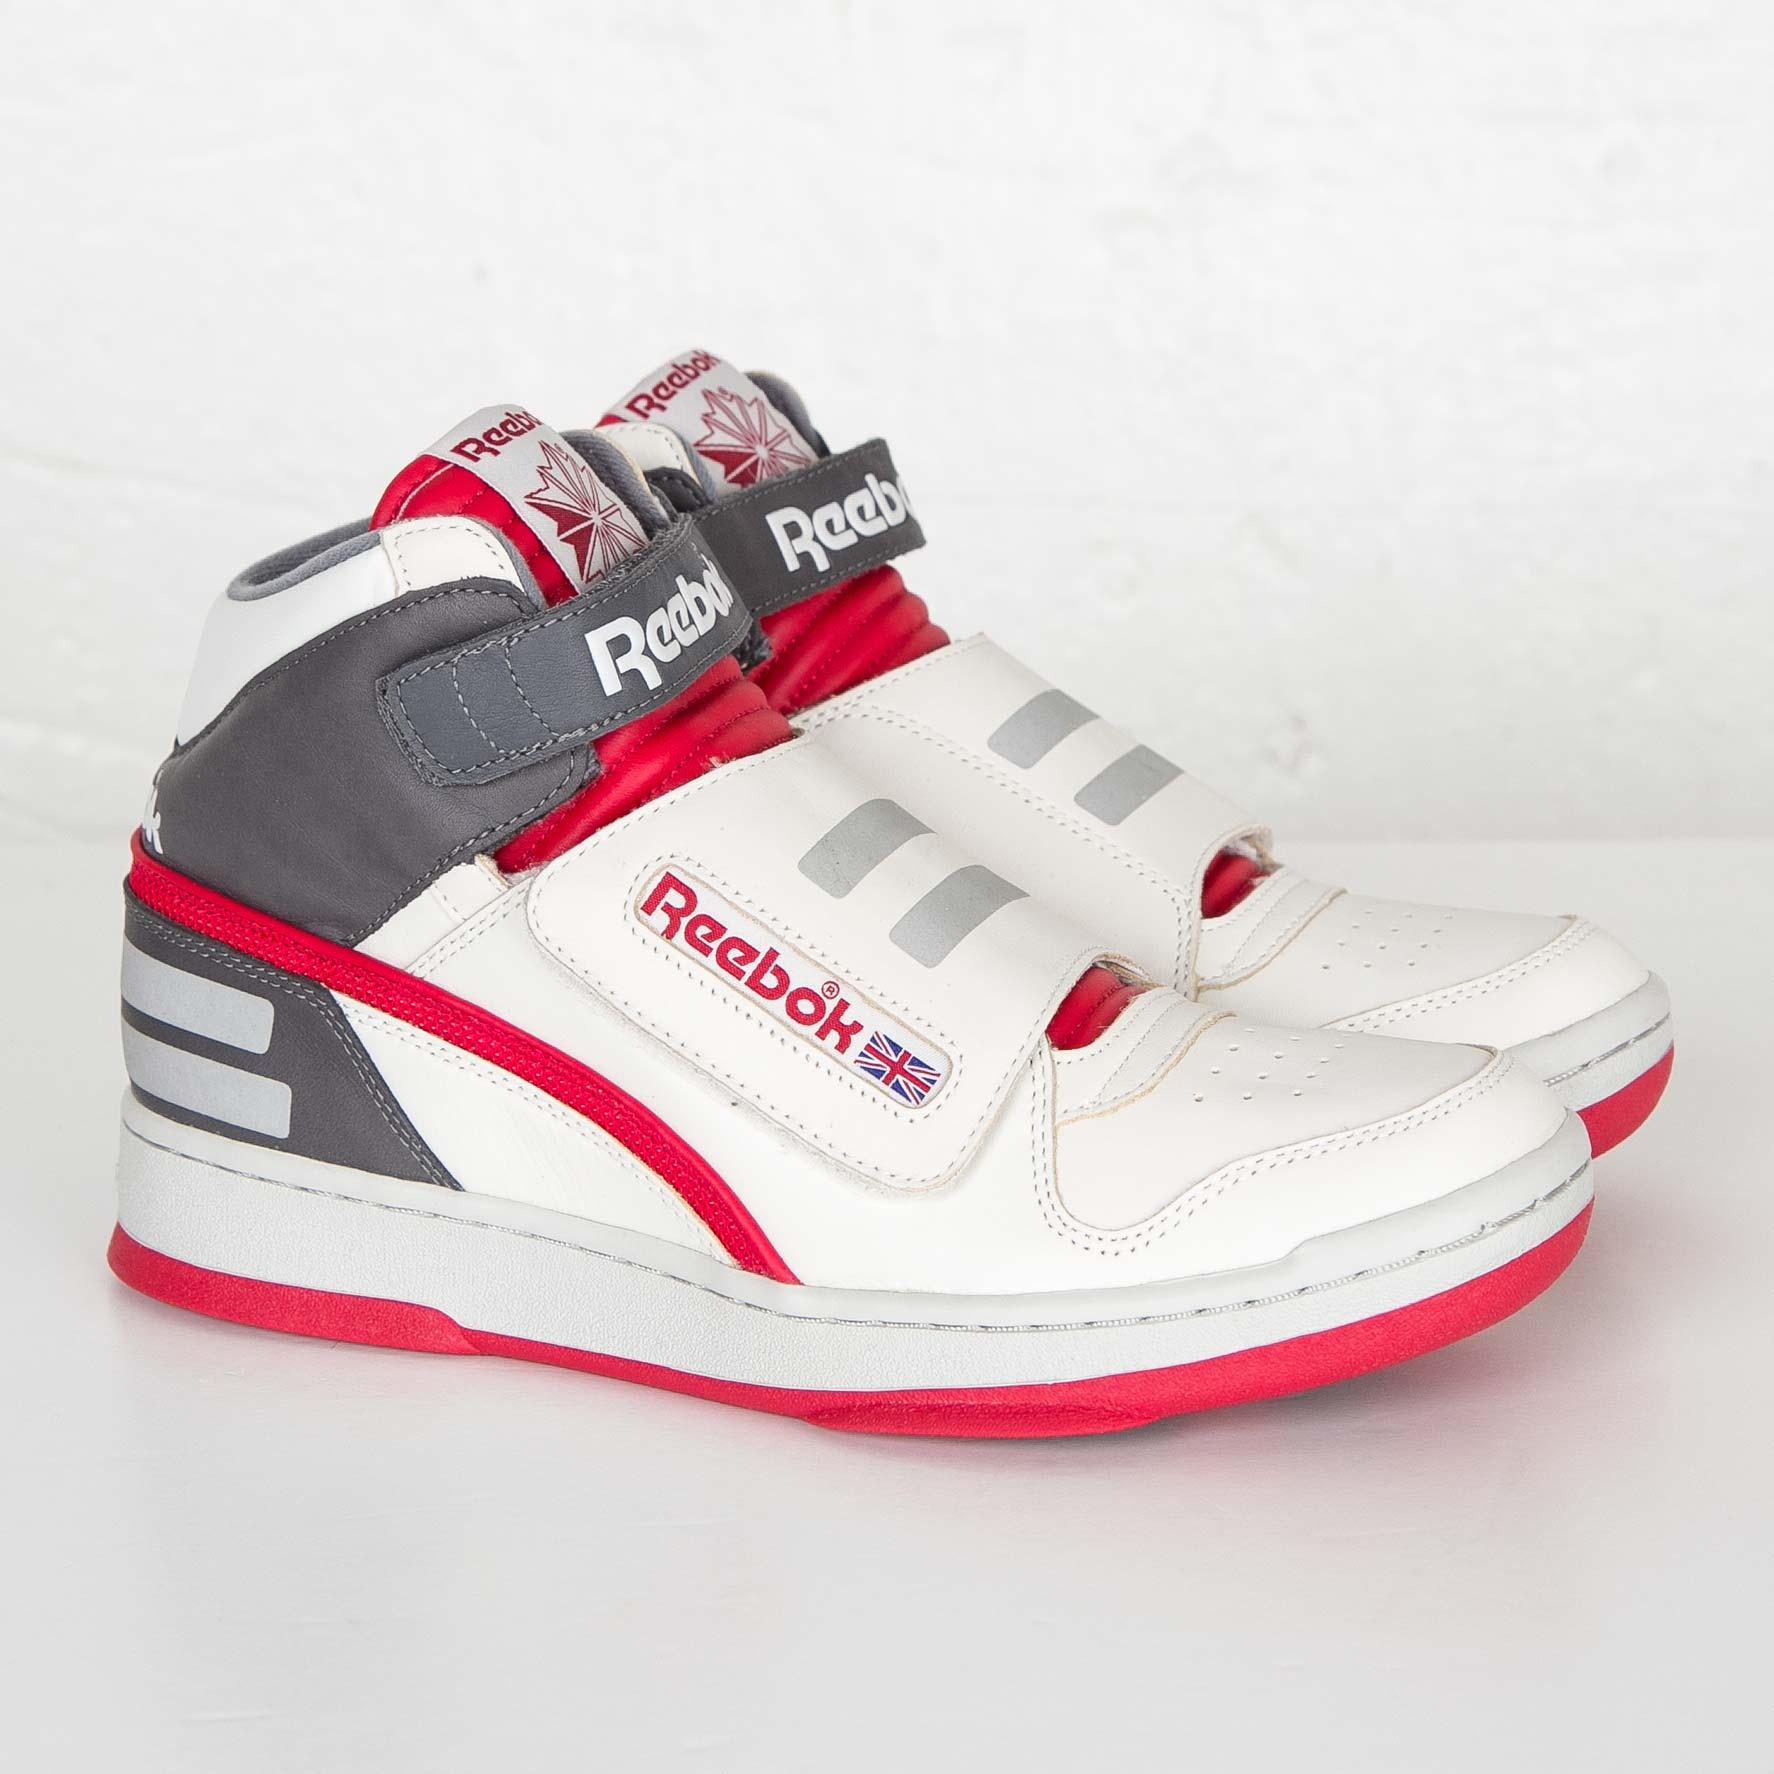 4fc1e4c16374 Reebok Alien Stomper Mid - V66526 - Sneakersnstuff